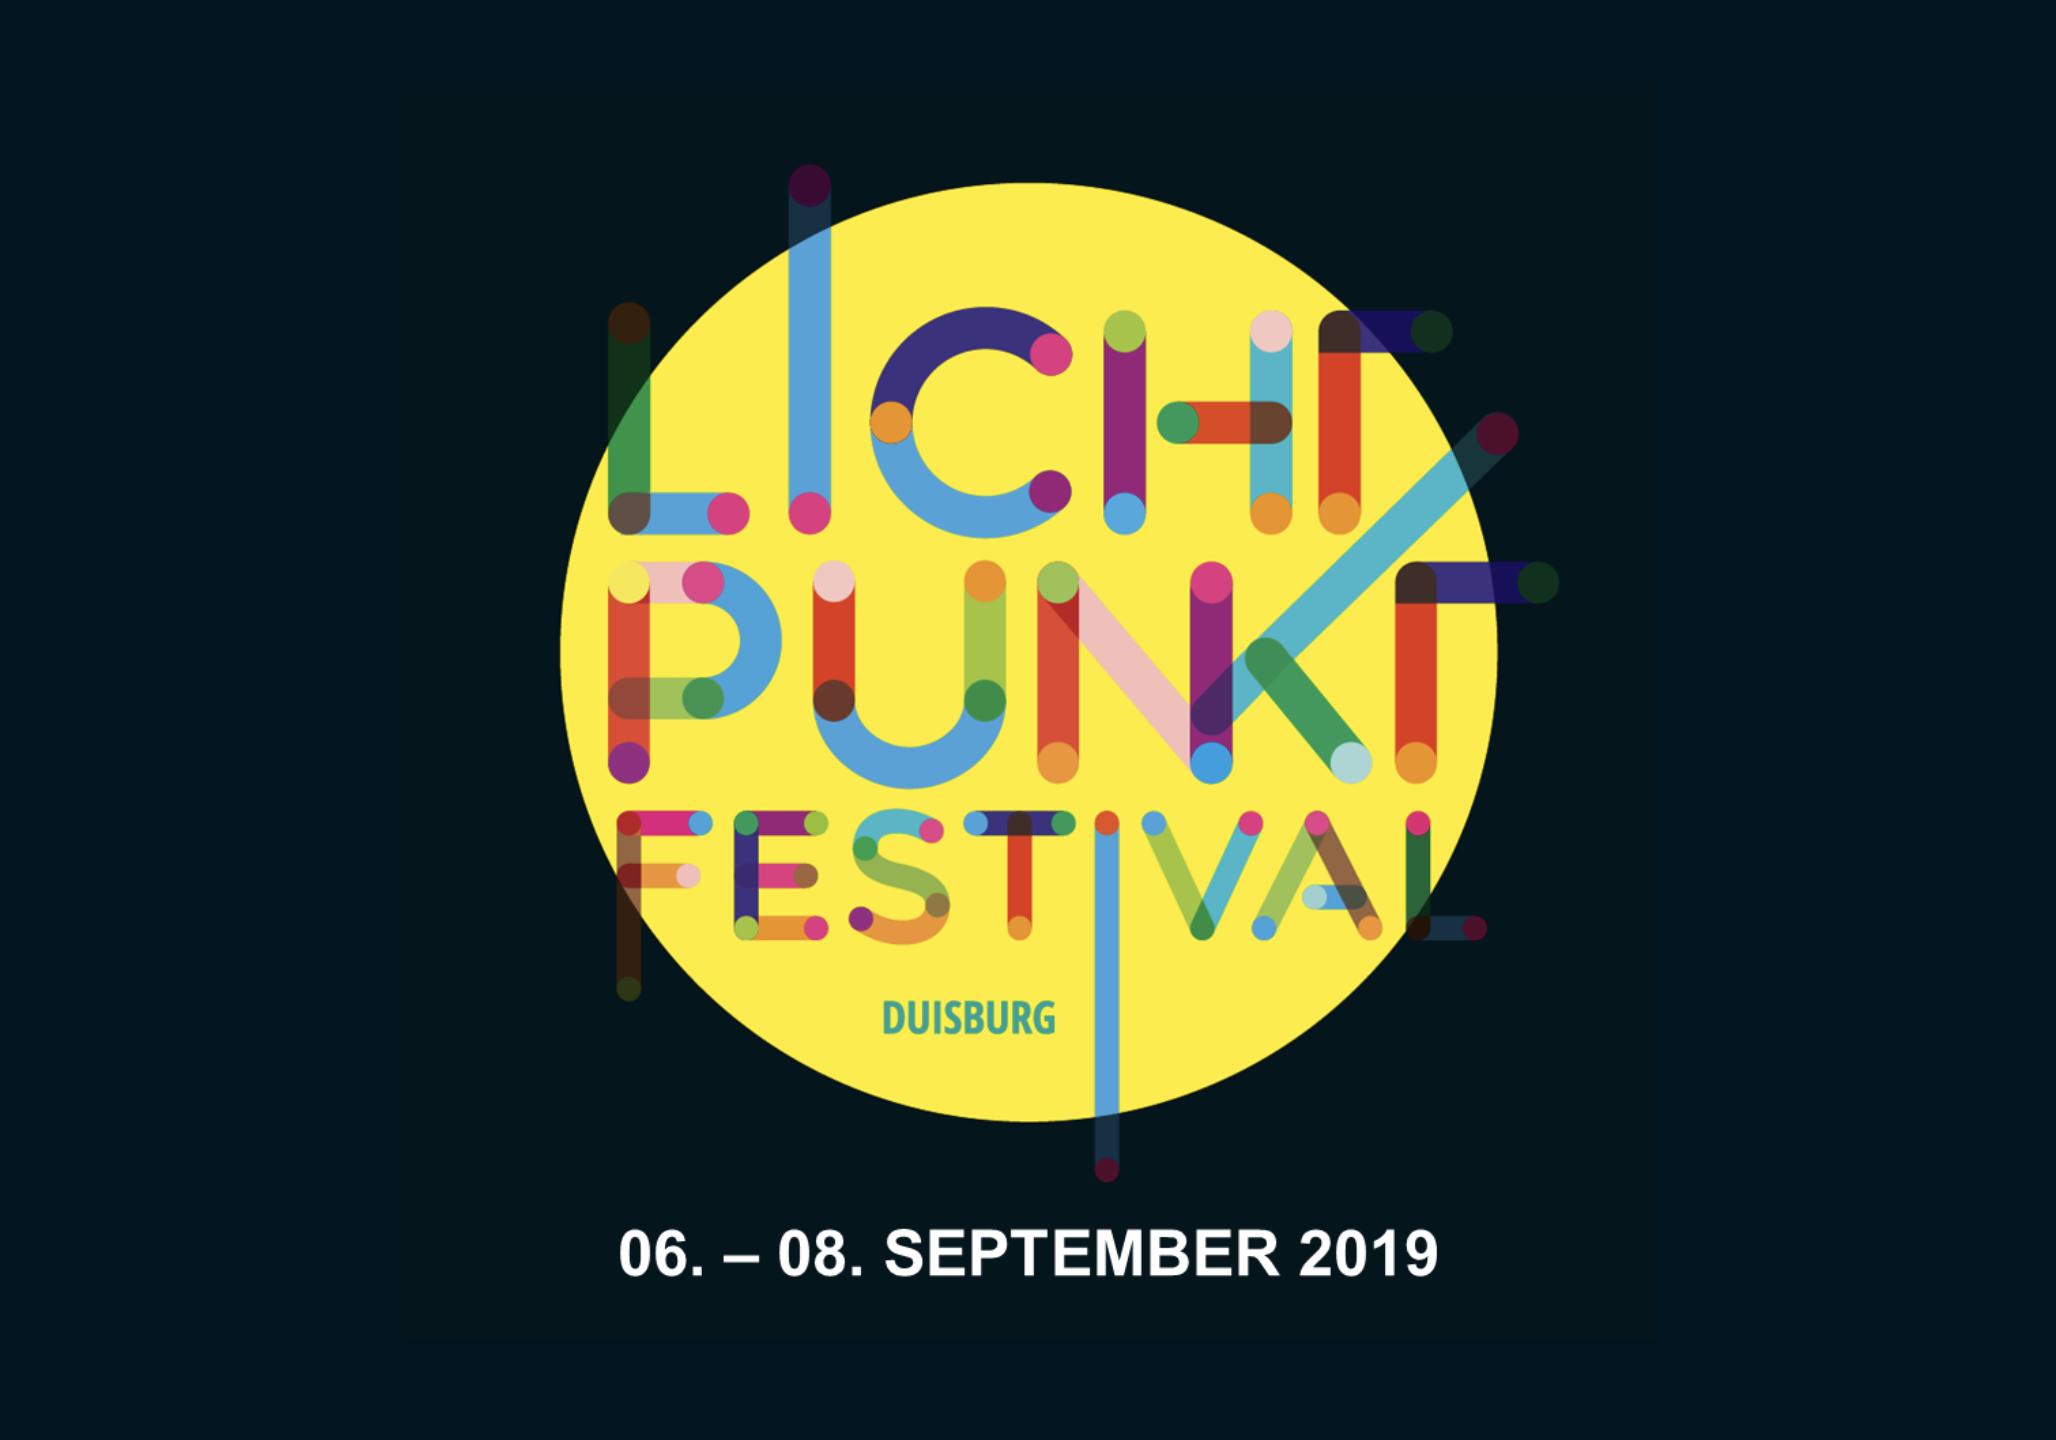 3. Lichtpunkt-Festival